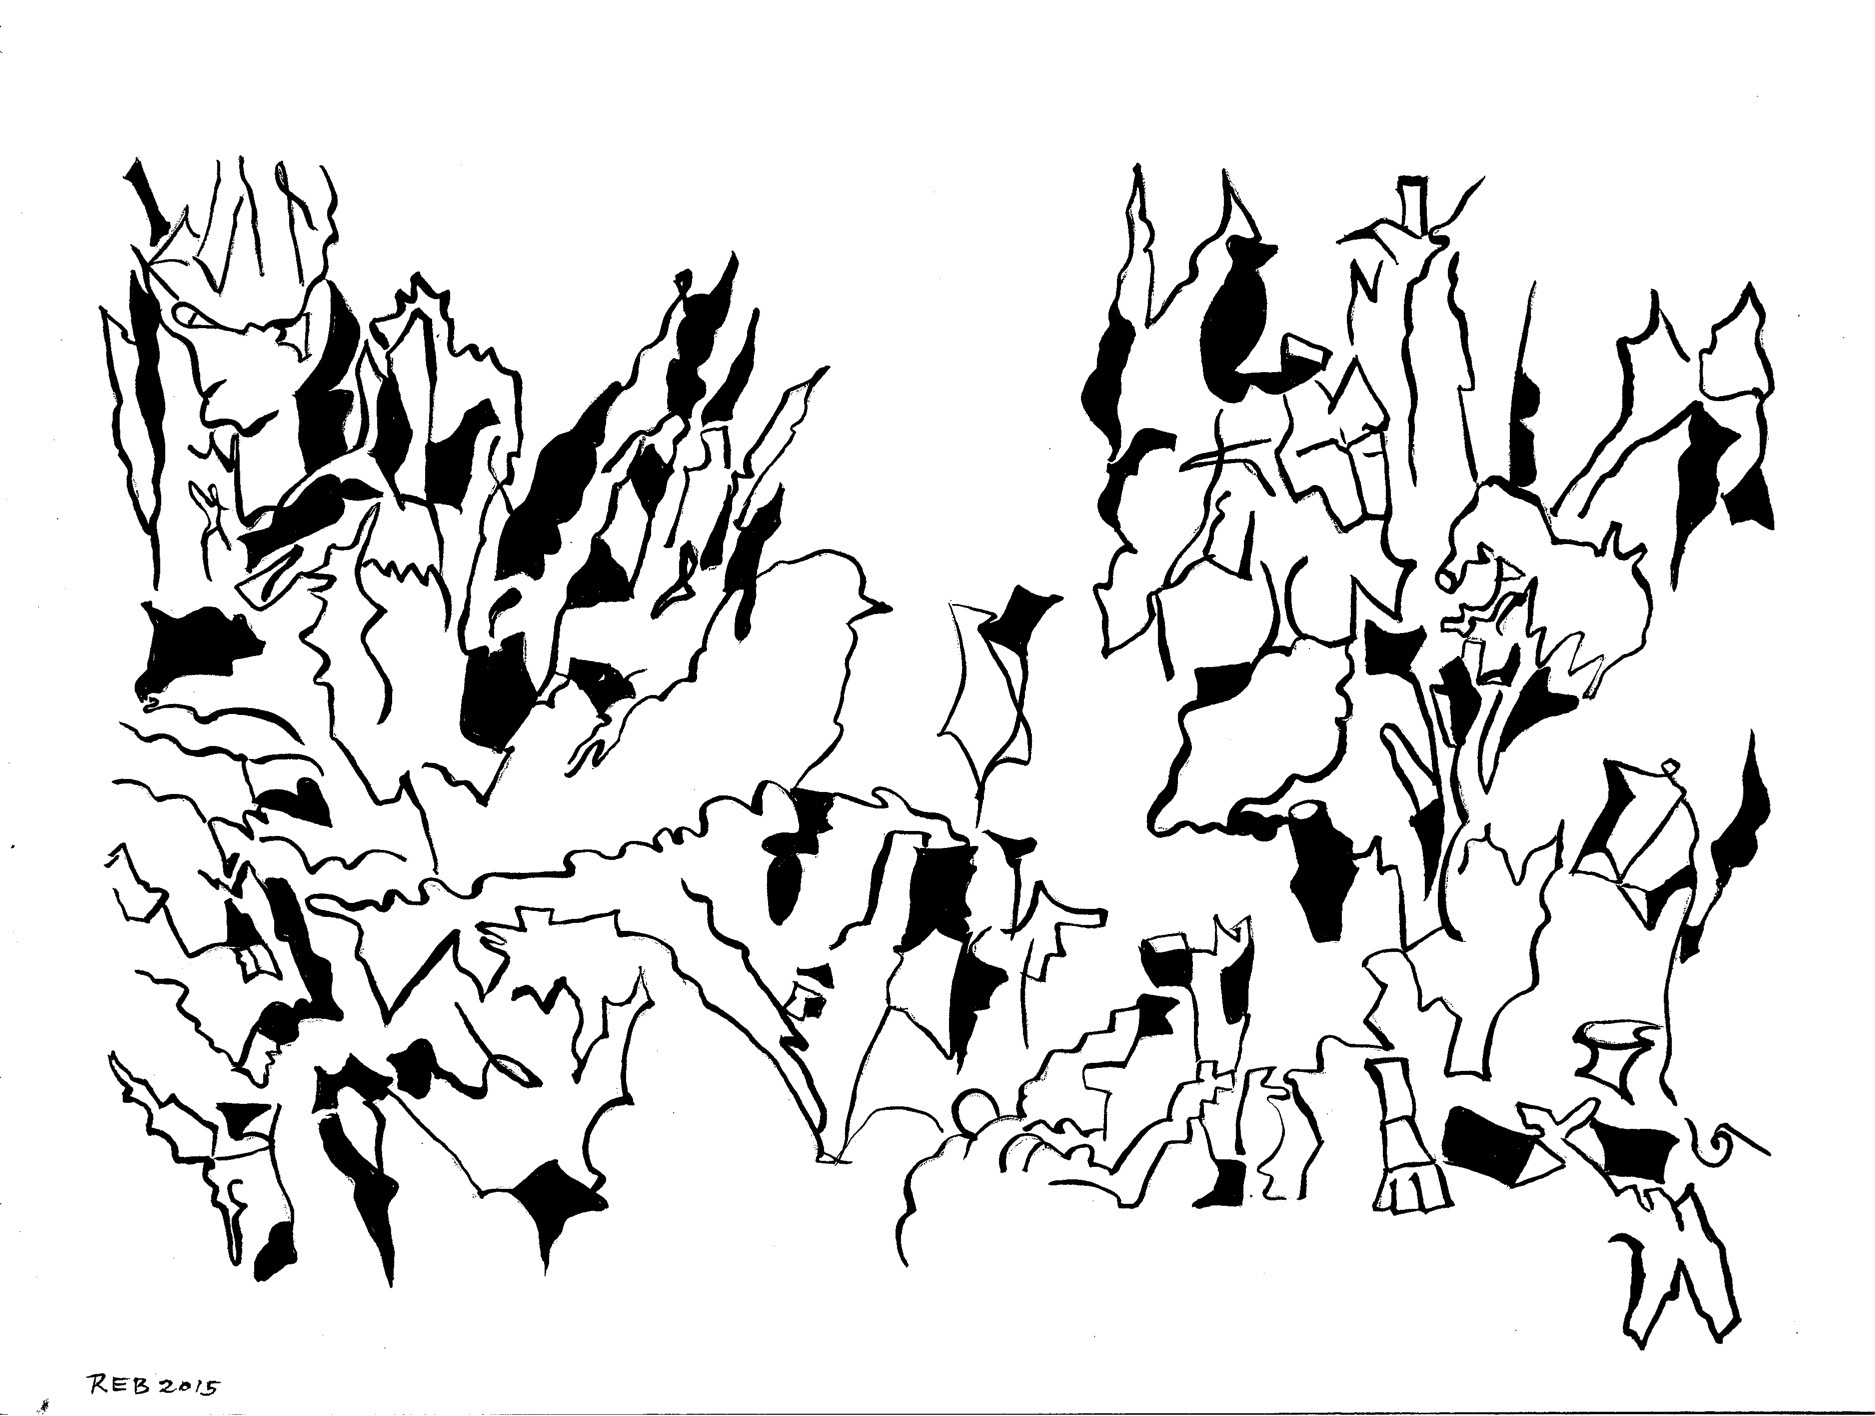 1875x1416 Drawings R E Bucheli Gallery Workshop